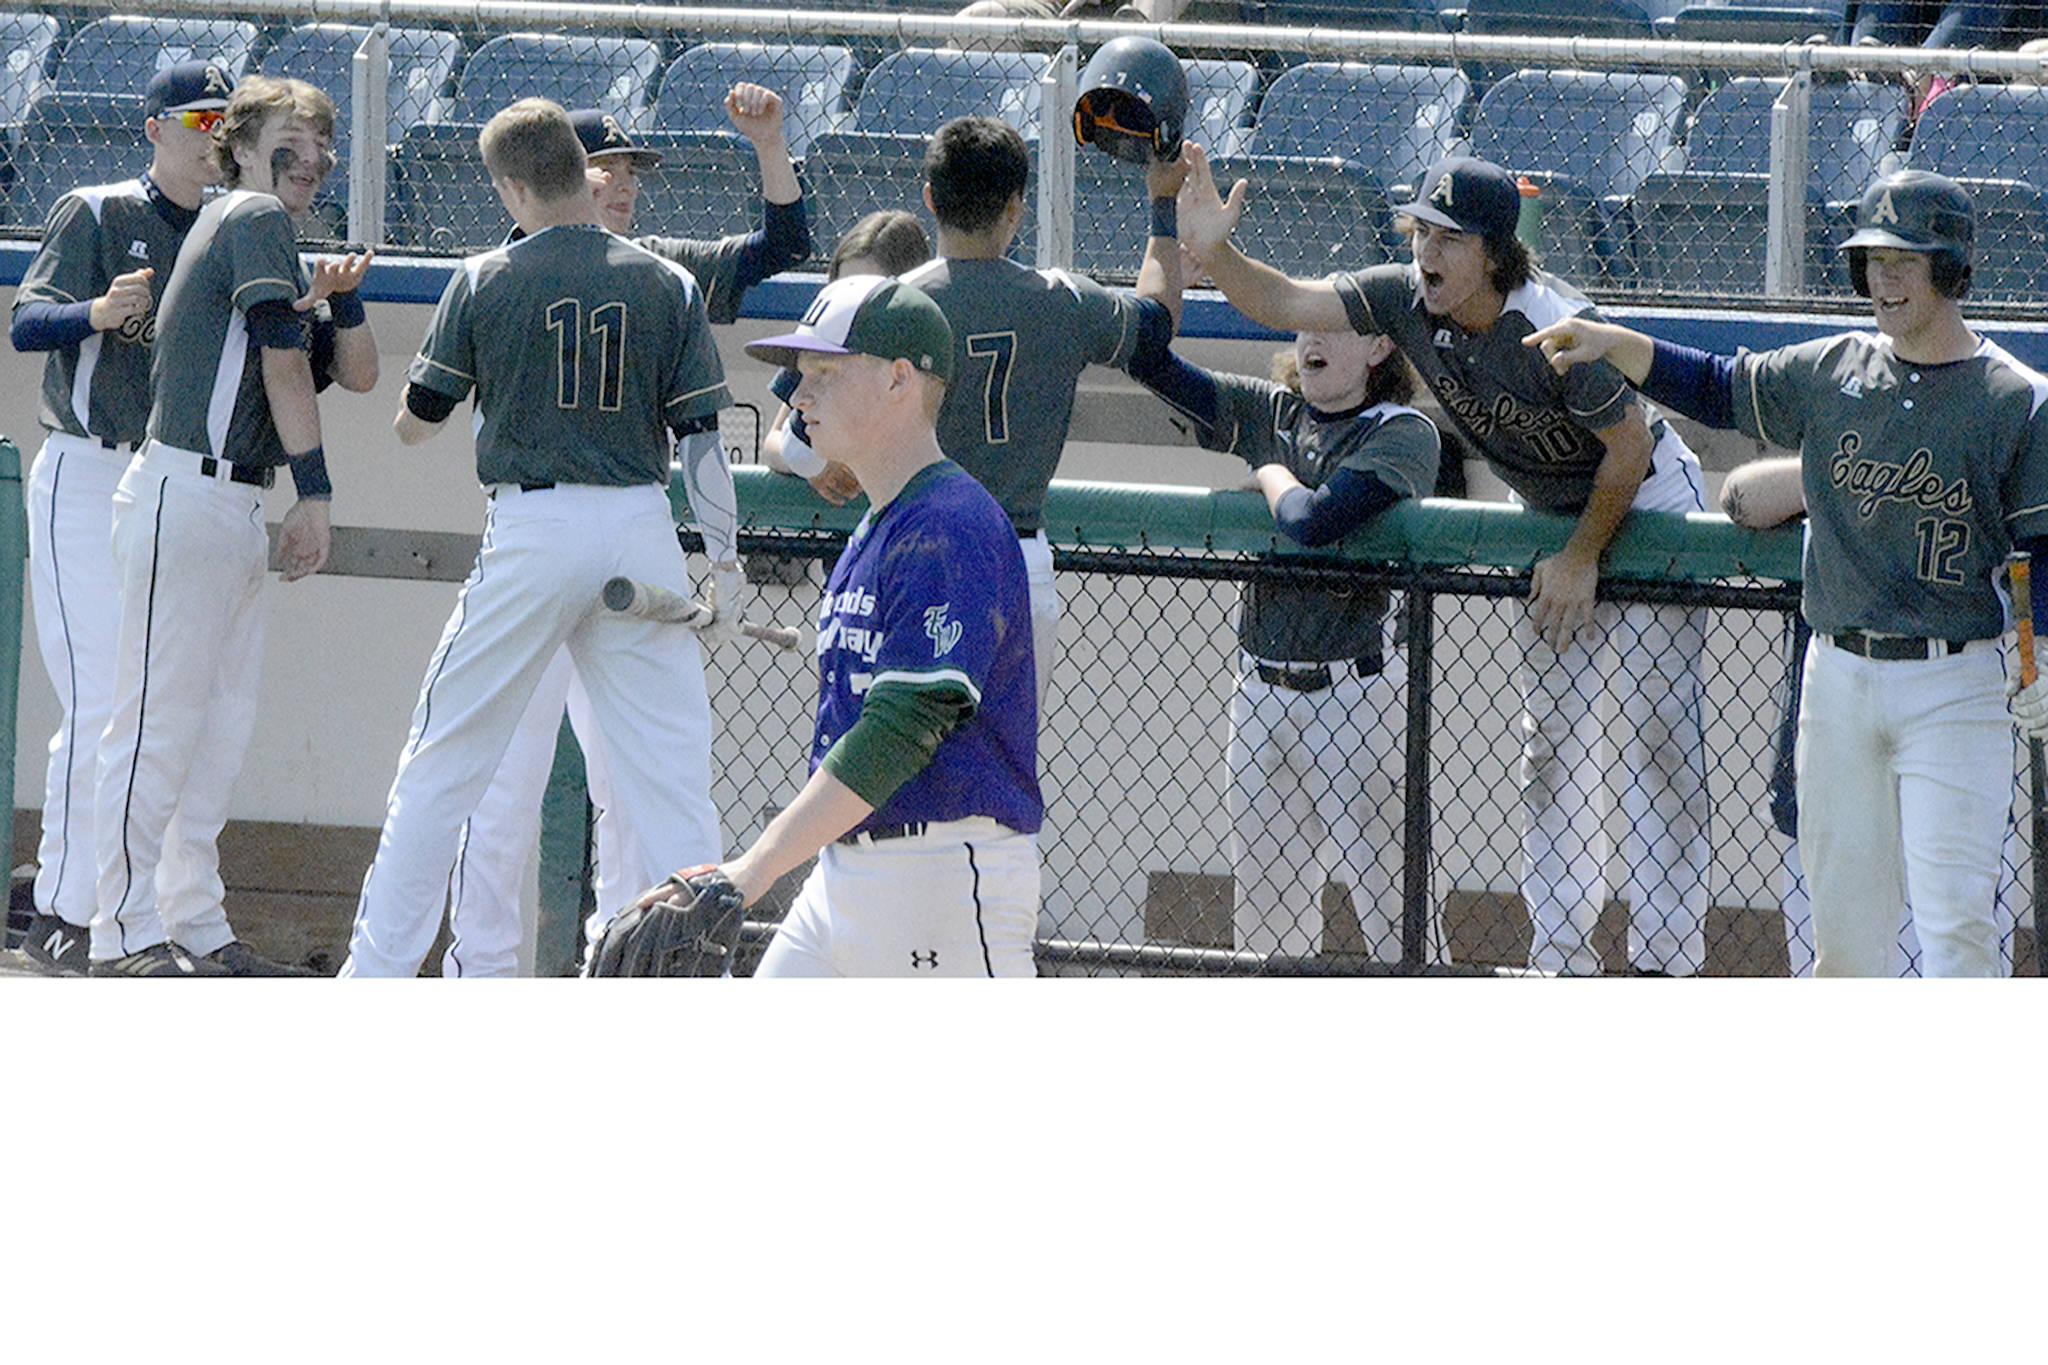 E-W's pitcher walks away as Arlington's boys baseball team celebrates their big inning.